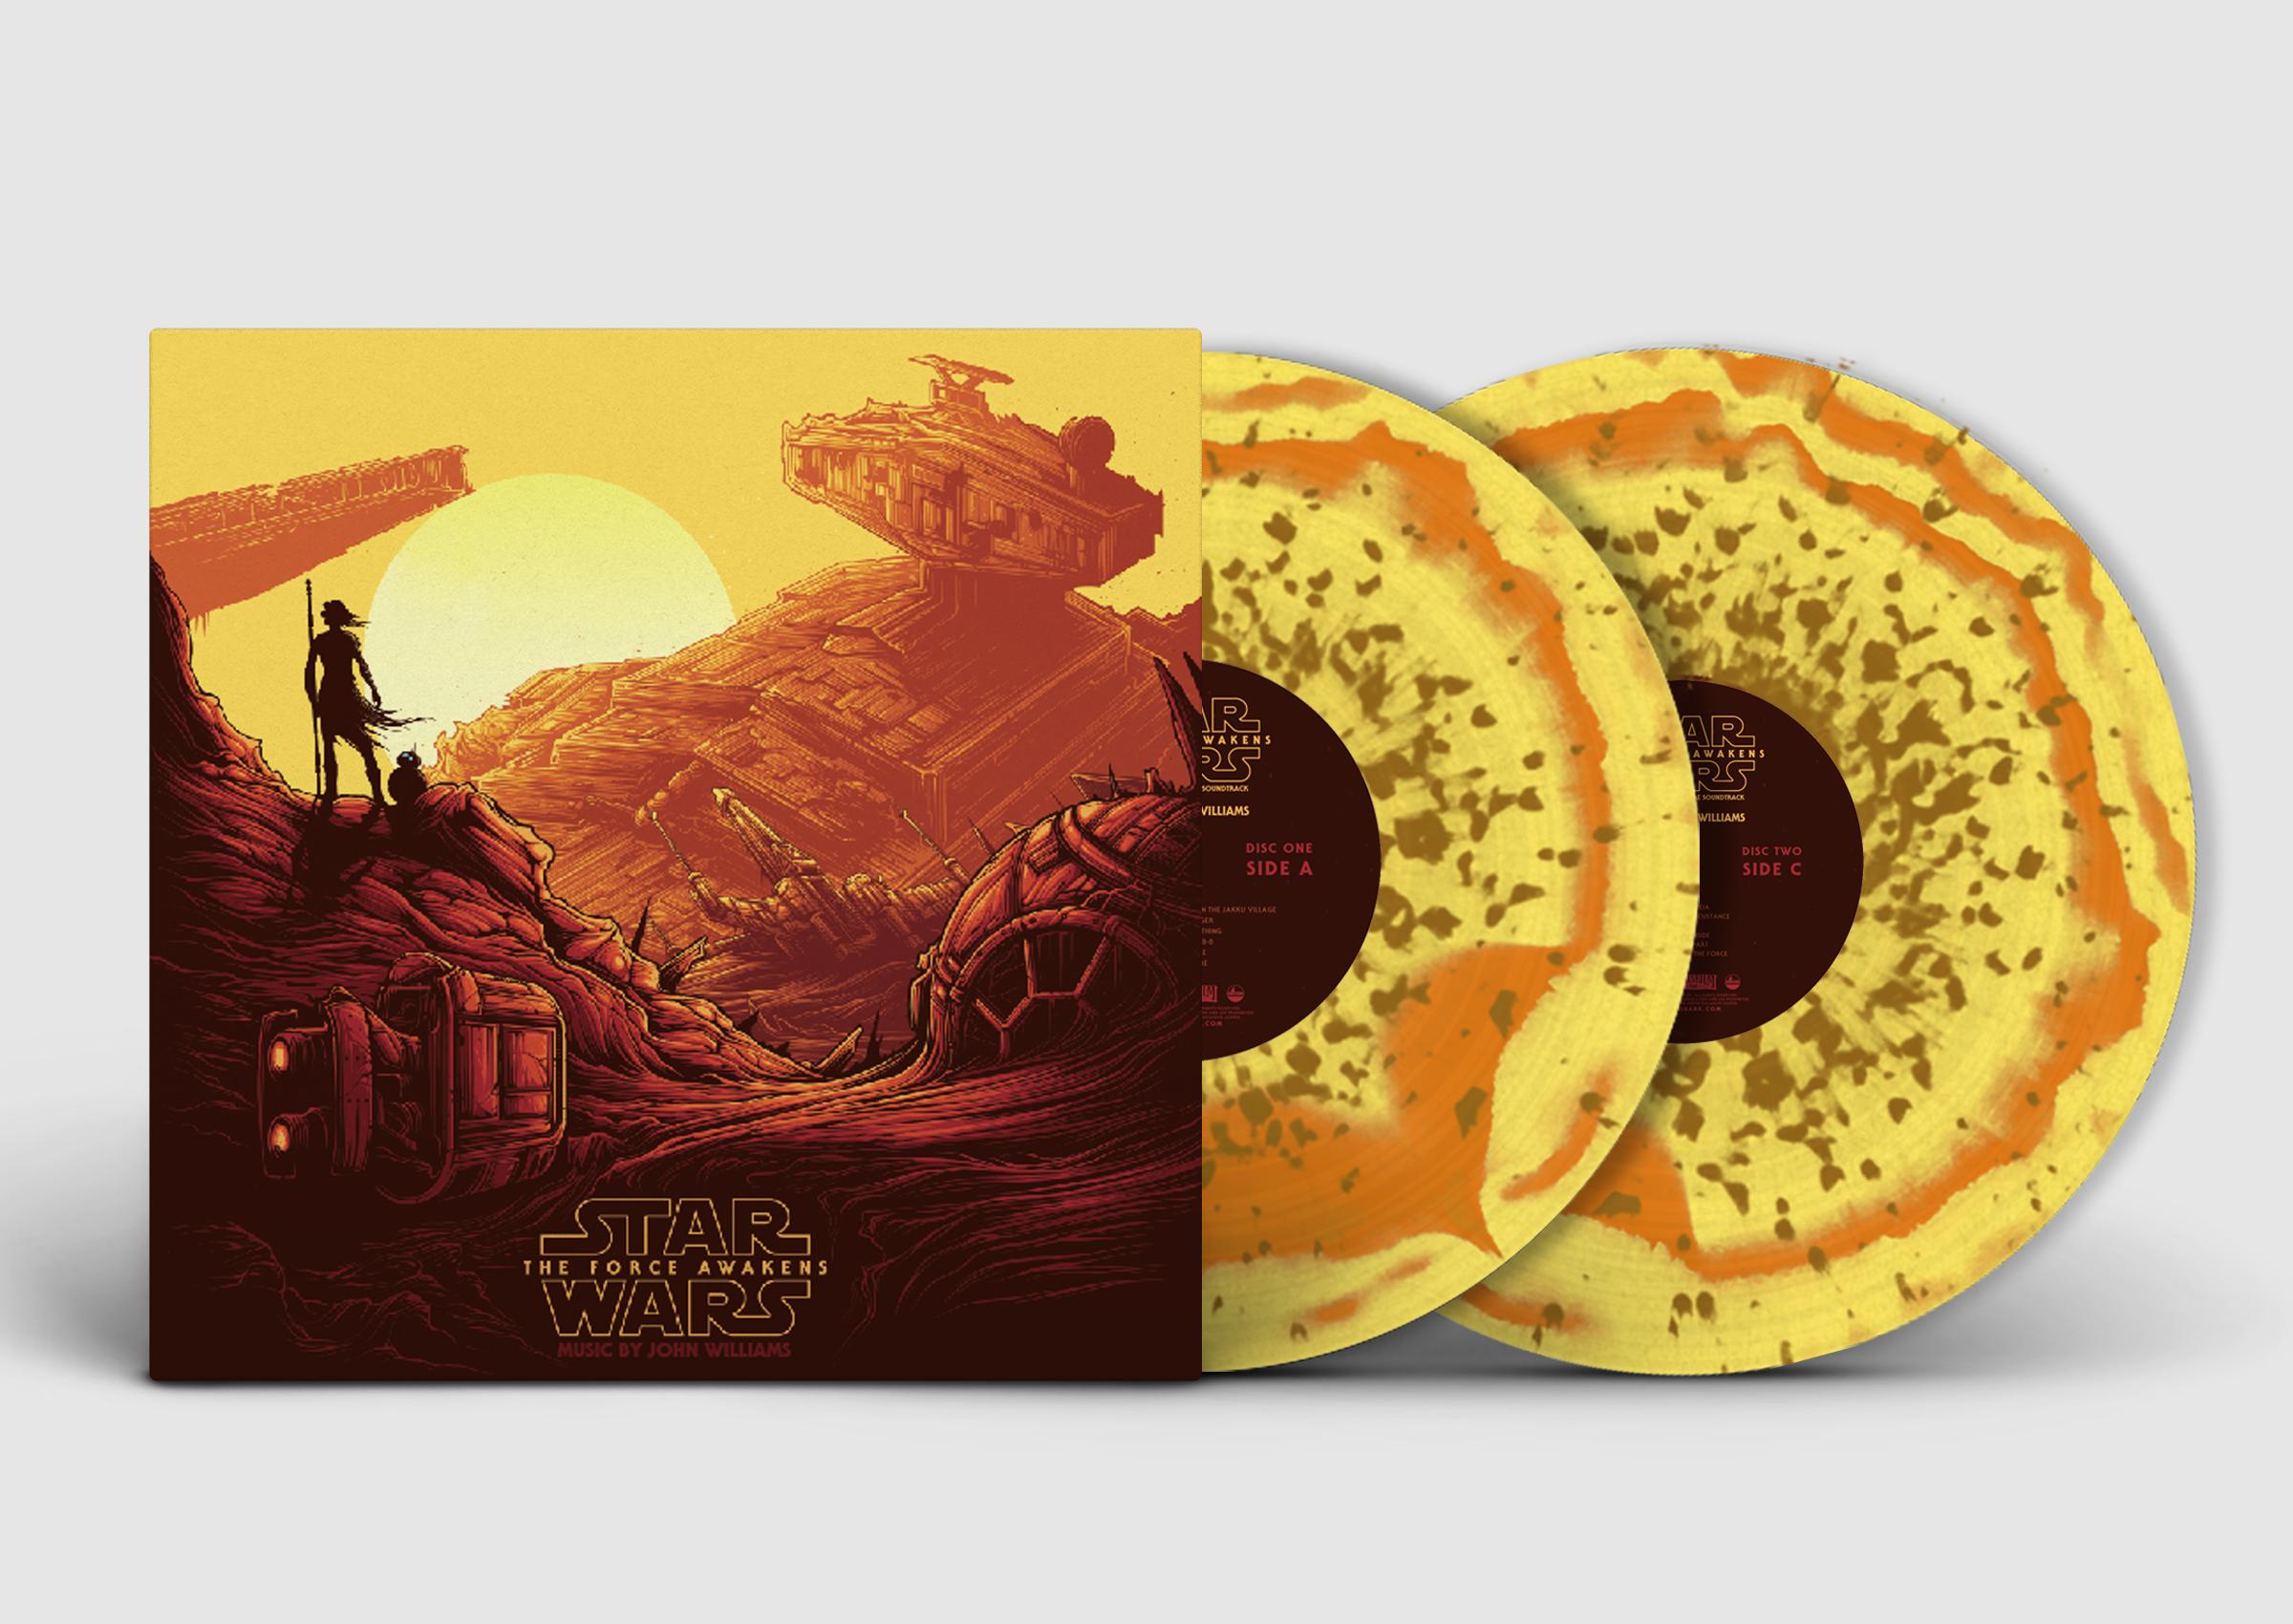 Discos de Vinil de Star Wars